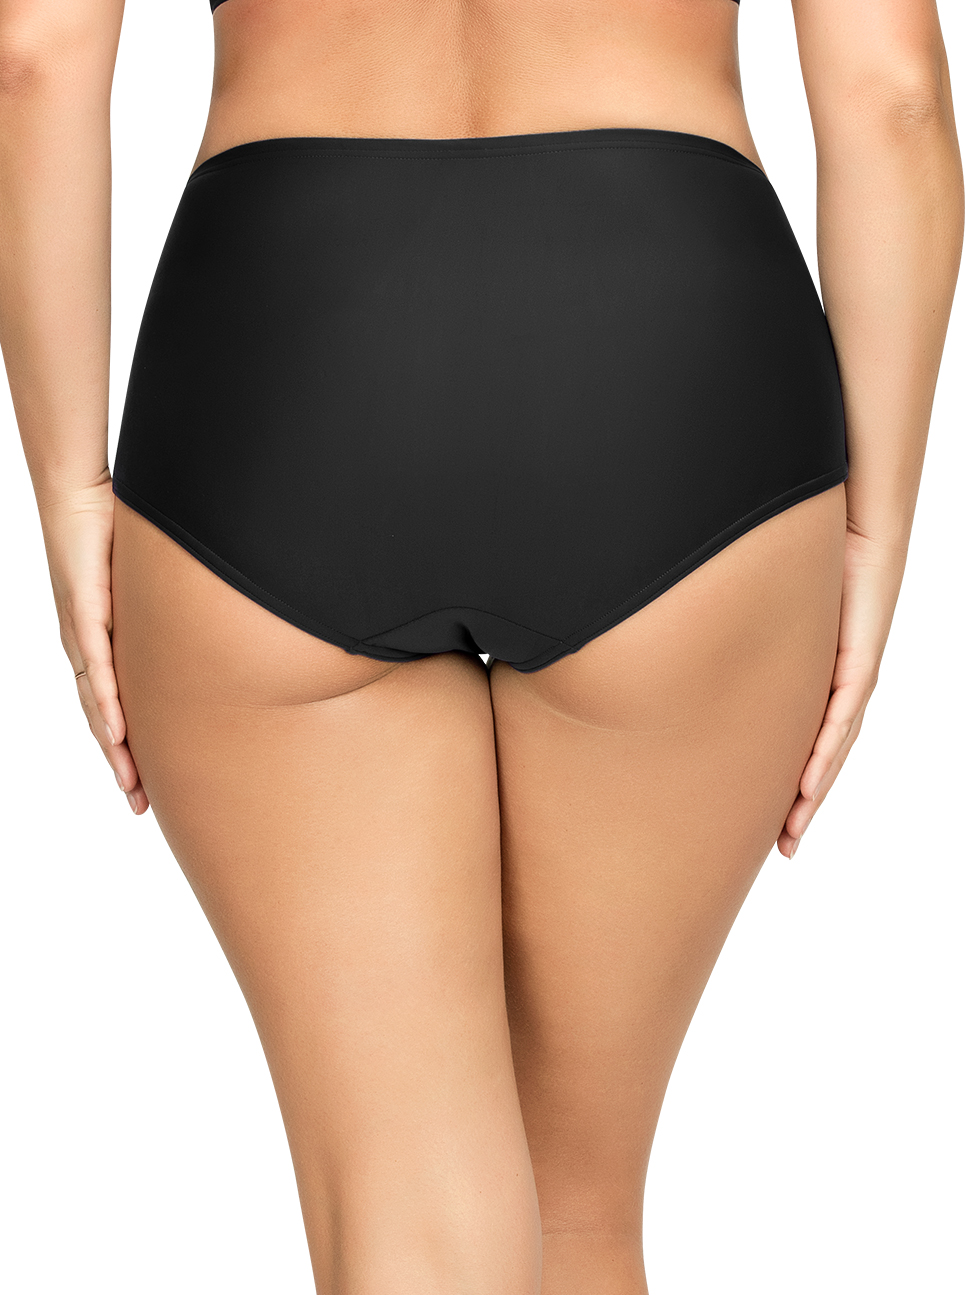 PARFAIT Keira HighWaistBikiniBottomS8075 Black Back - Keira High-Waist Bikini Bottom Black S8075